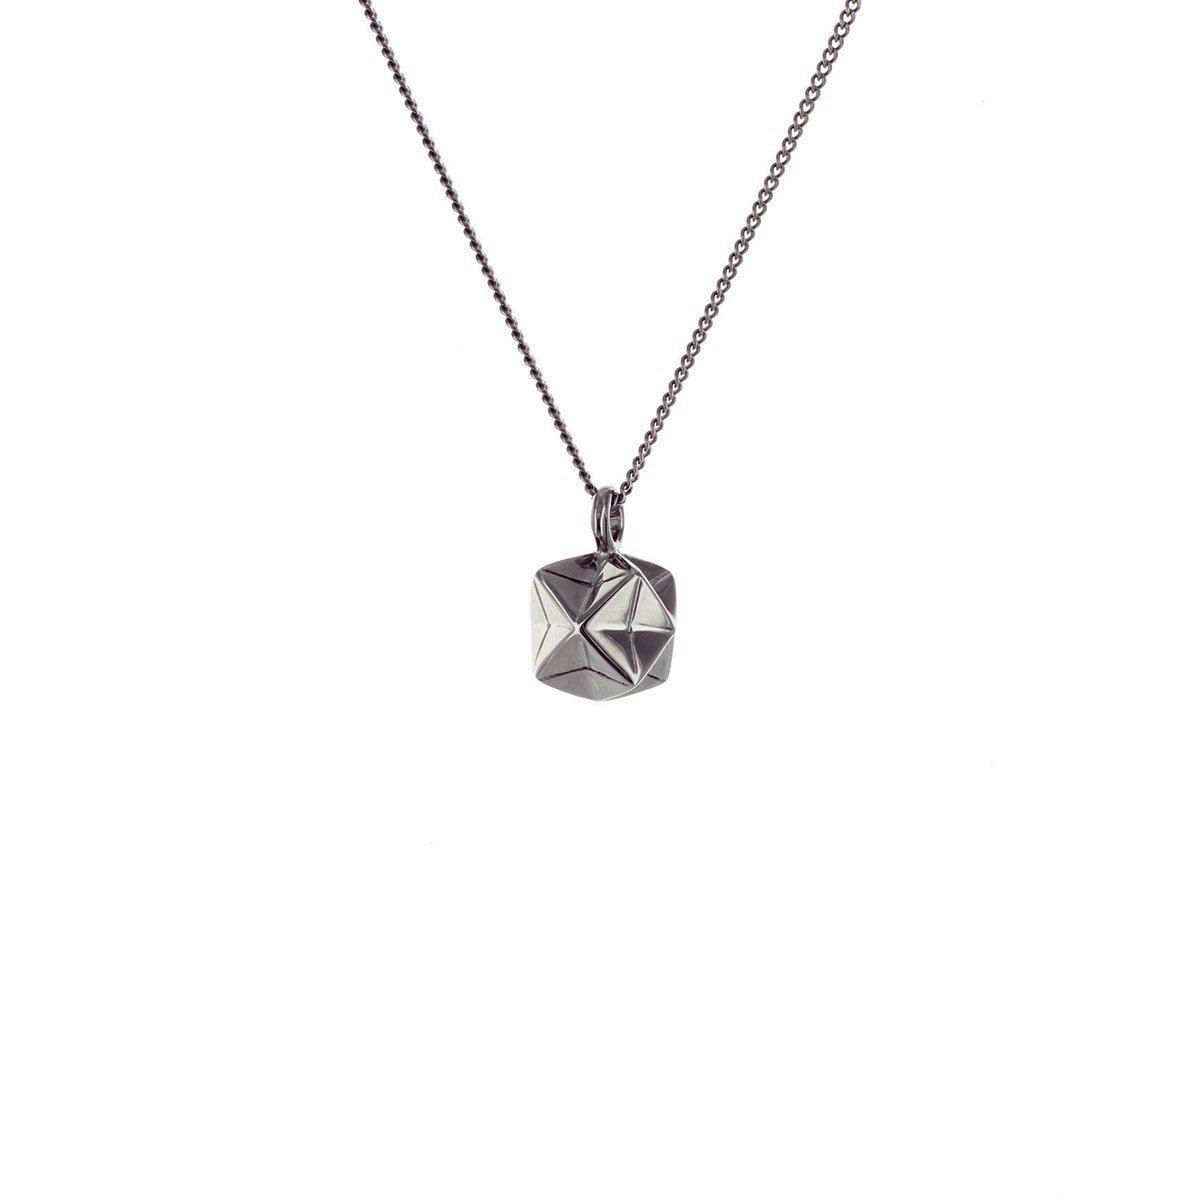 Origami Jewellery Black Silver Mini Magic Ball Origami Necklace 2IsJOo71n